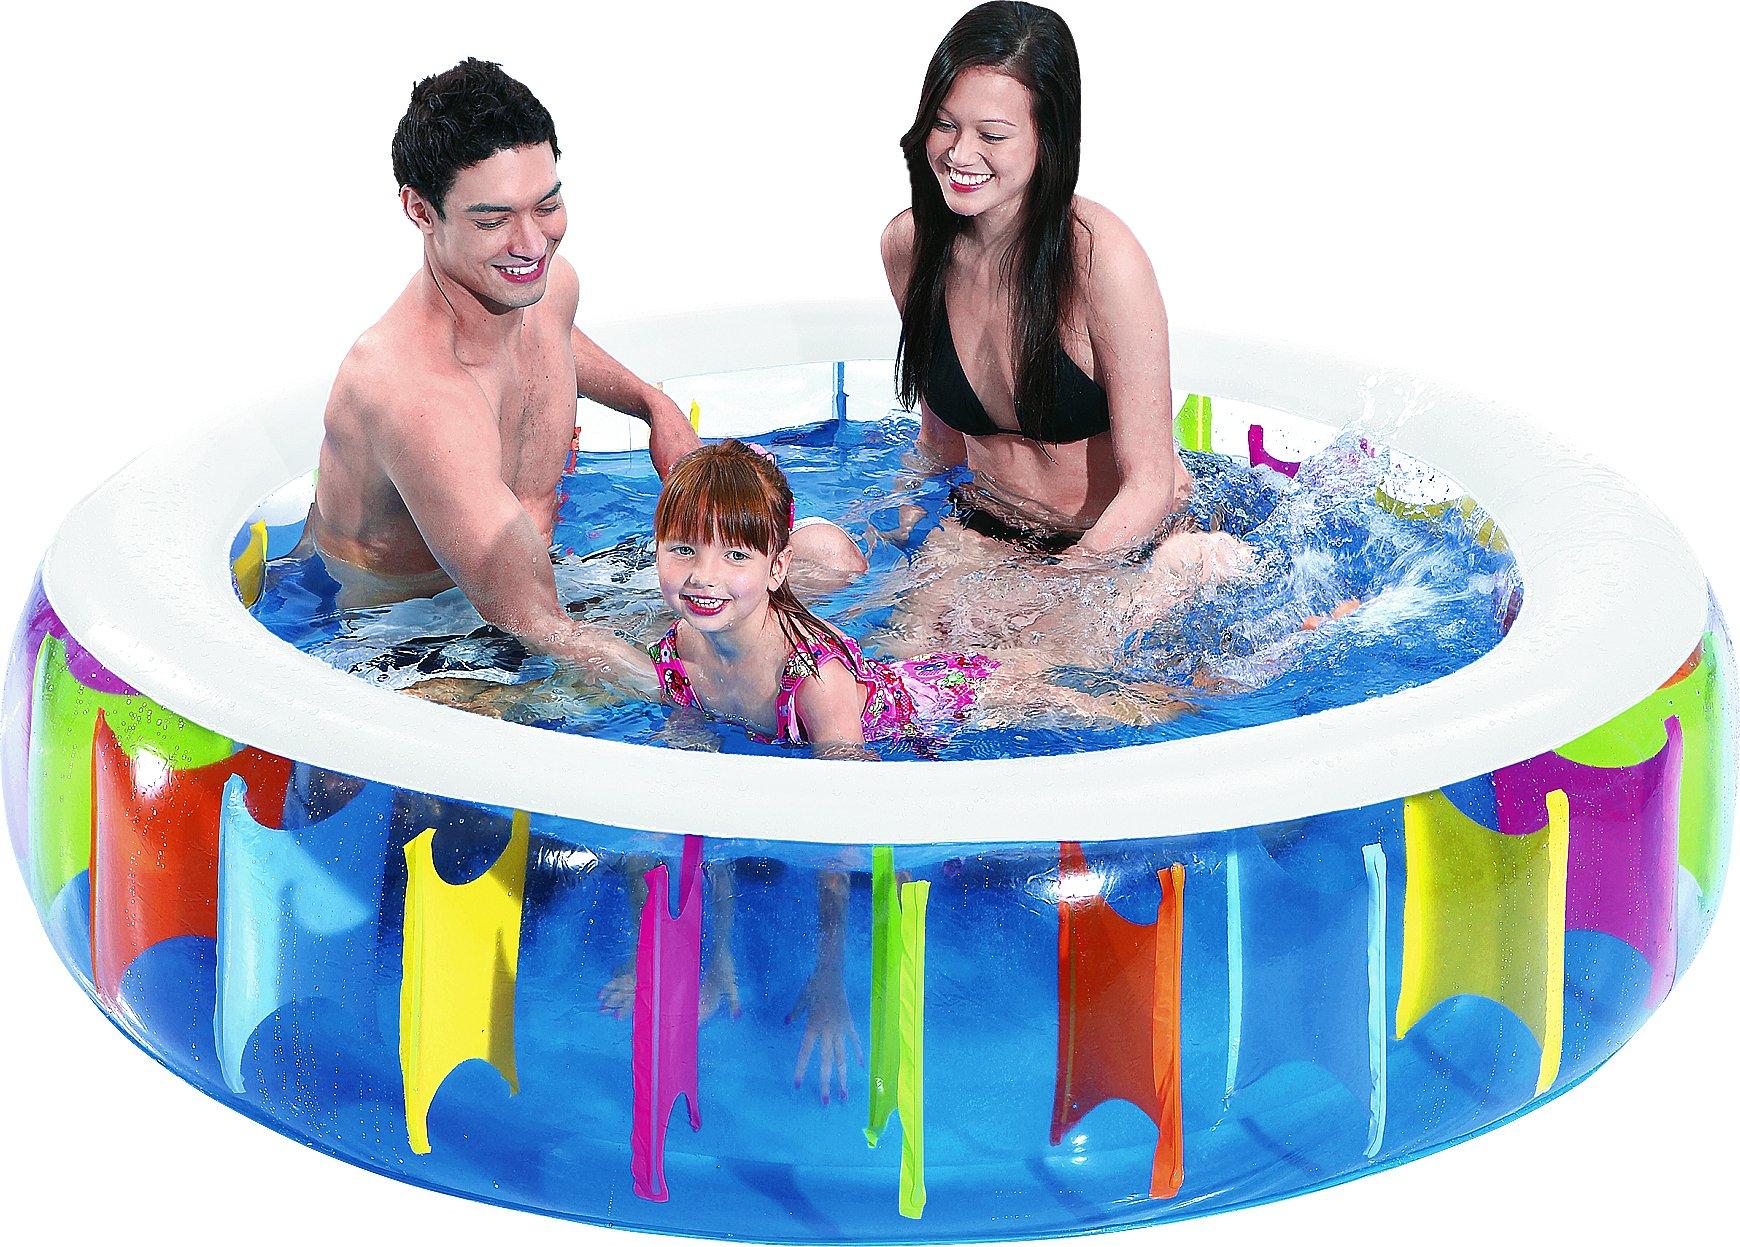 Jilong Rainbow Inflatable Kiddie Pool by Jilong